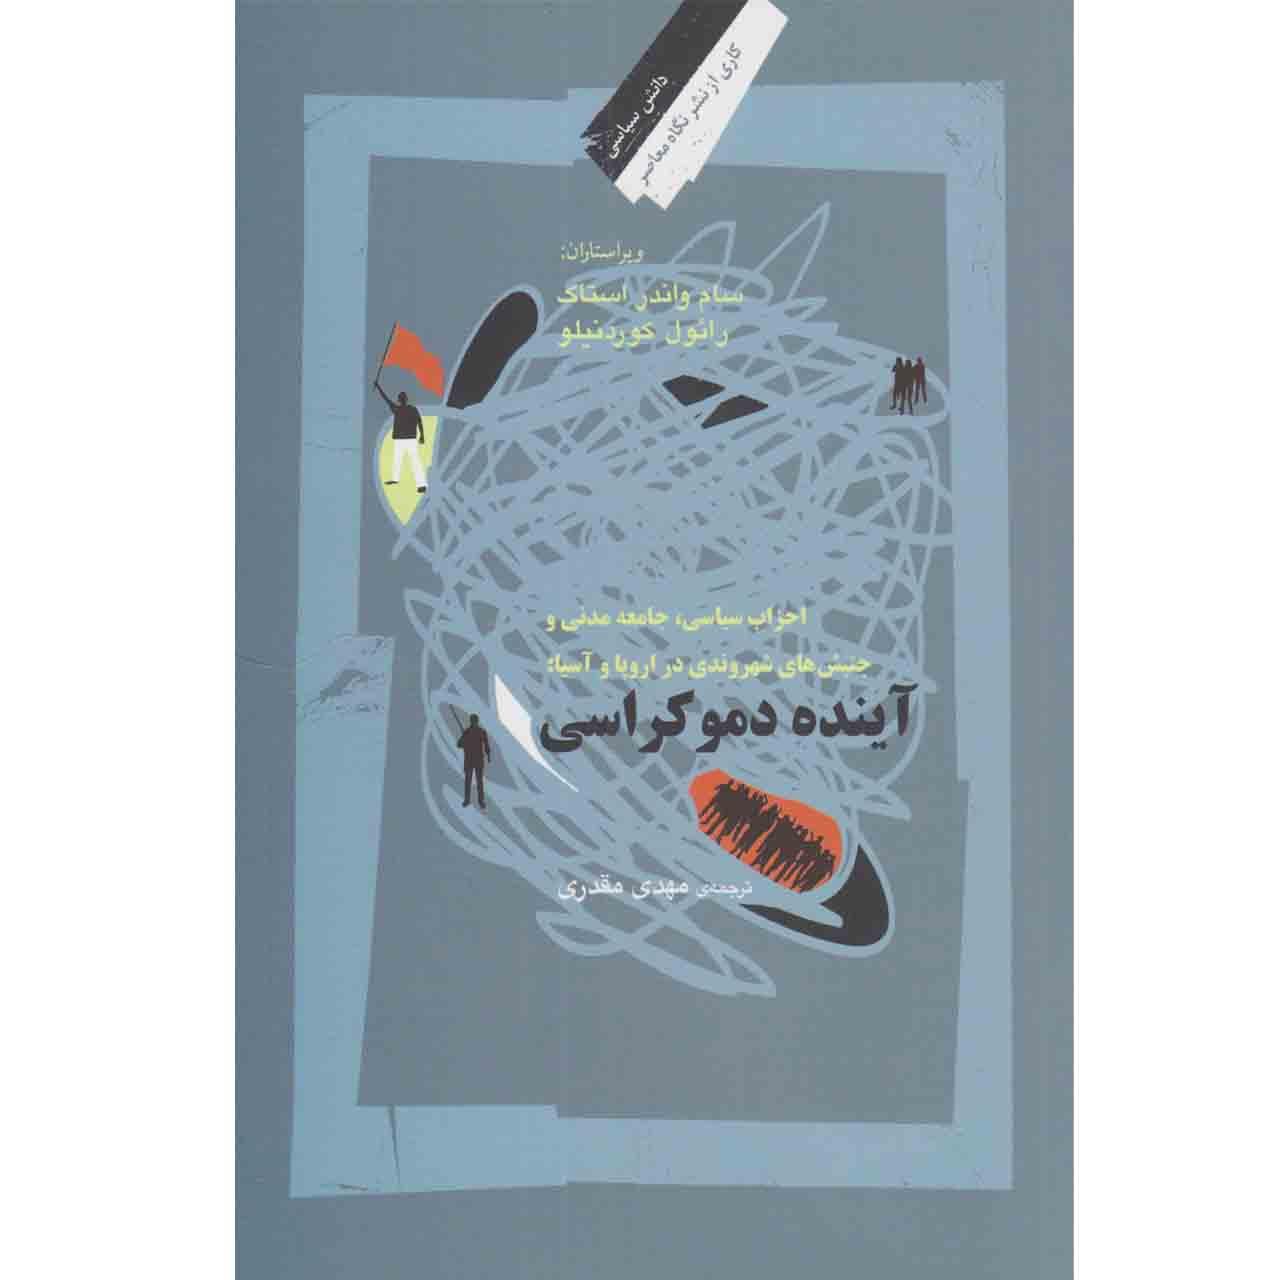 کتاب آینده دموکراسی اثر سام واندر استاک.رائول کوردنیلو نشر نگاه معاصر